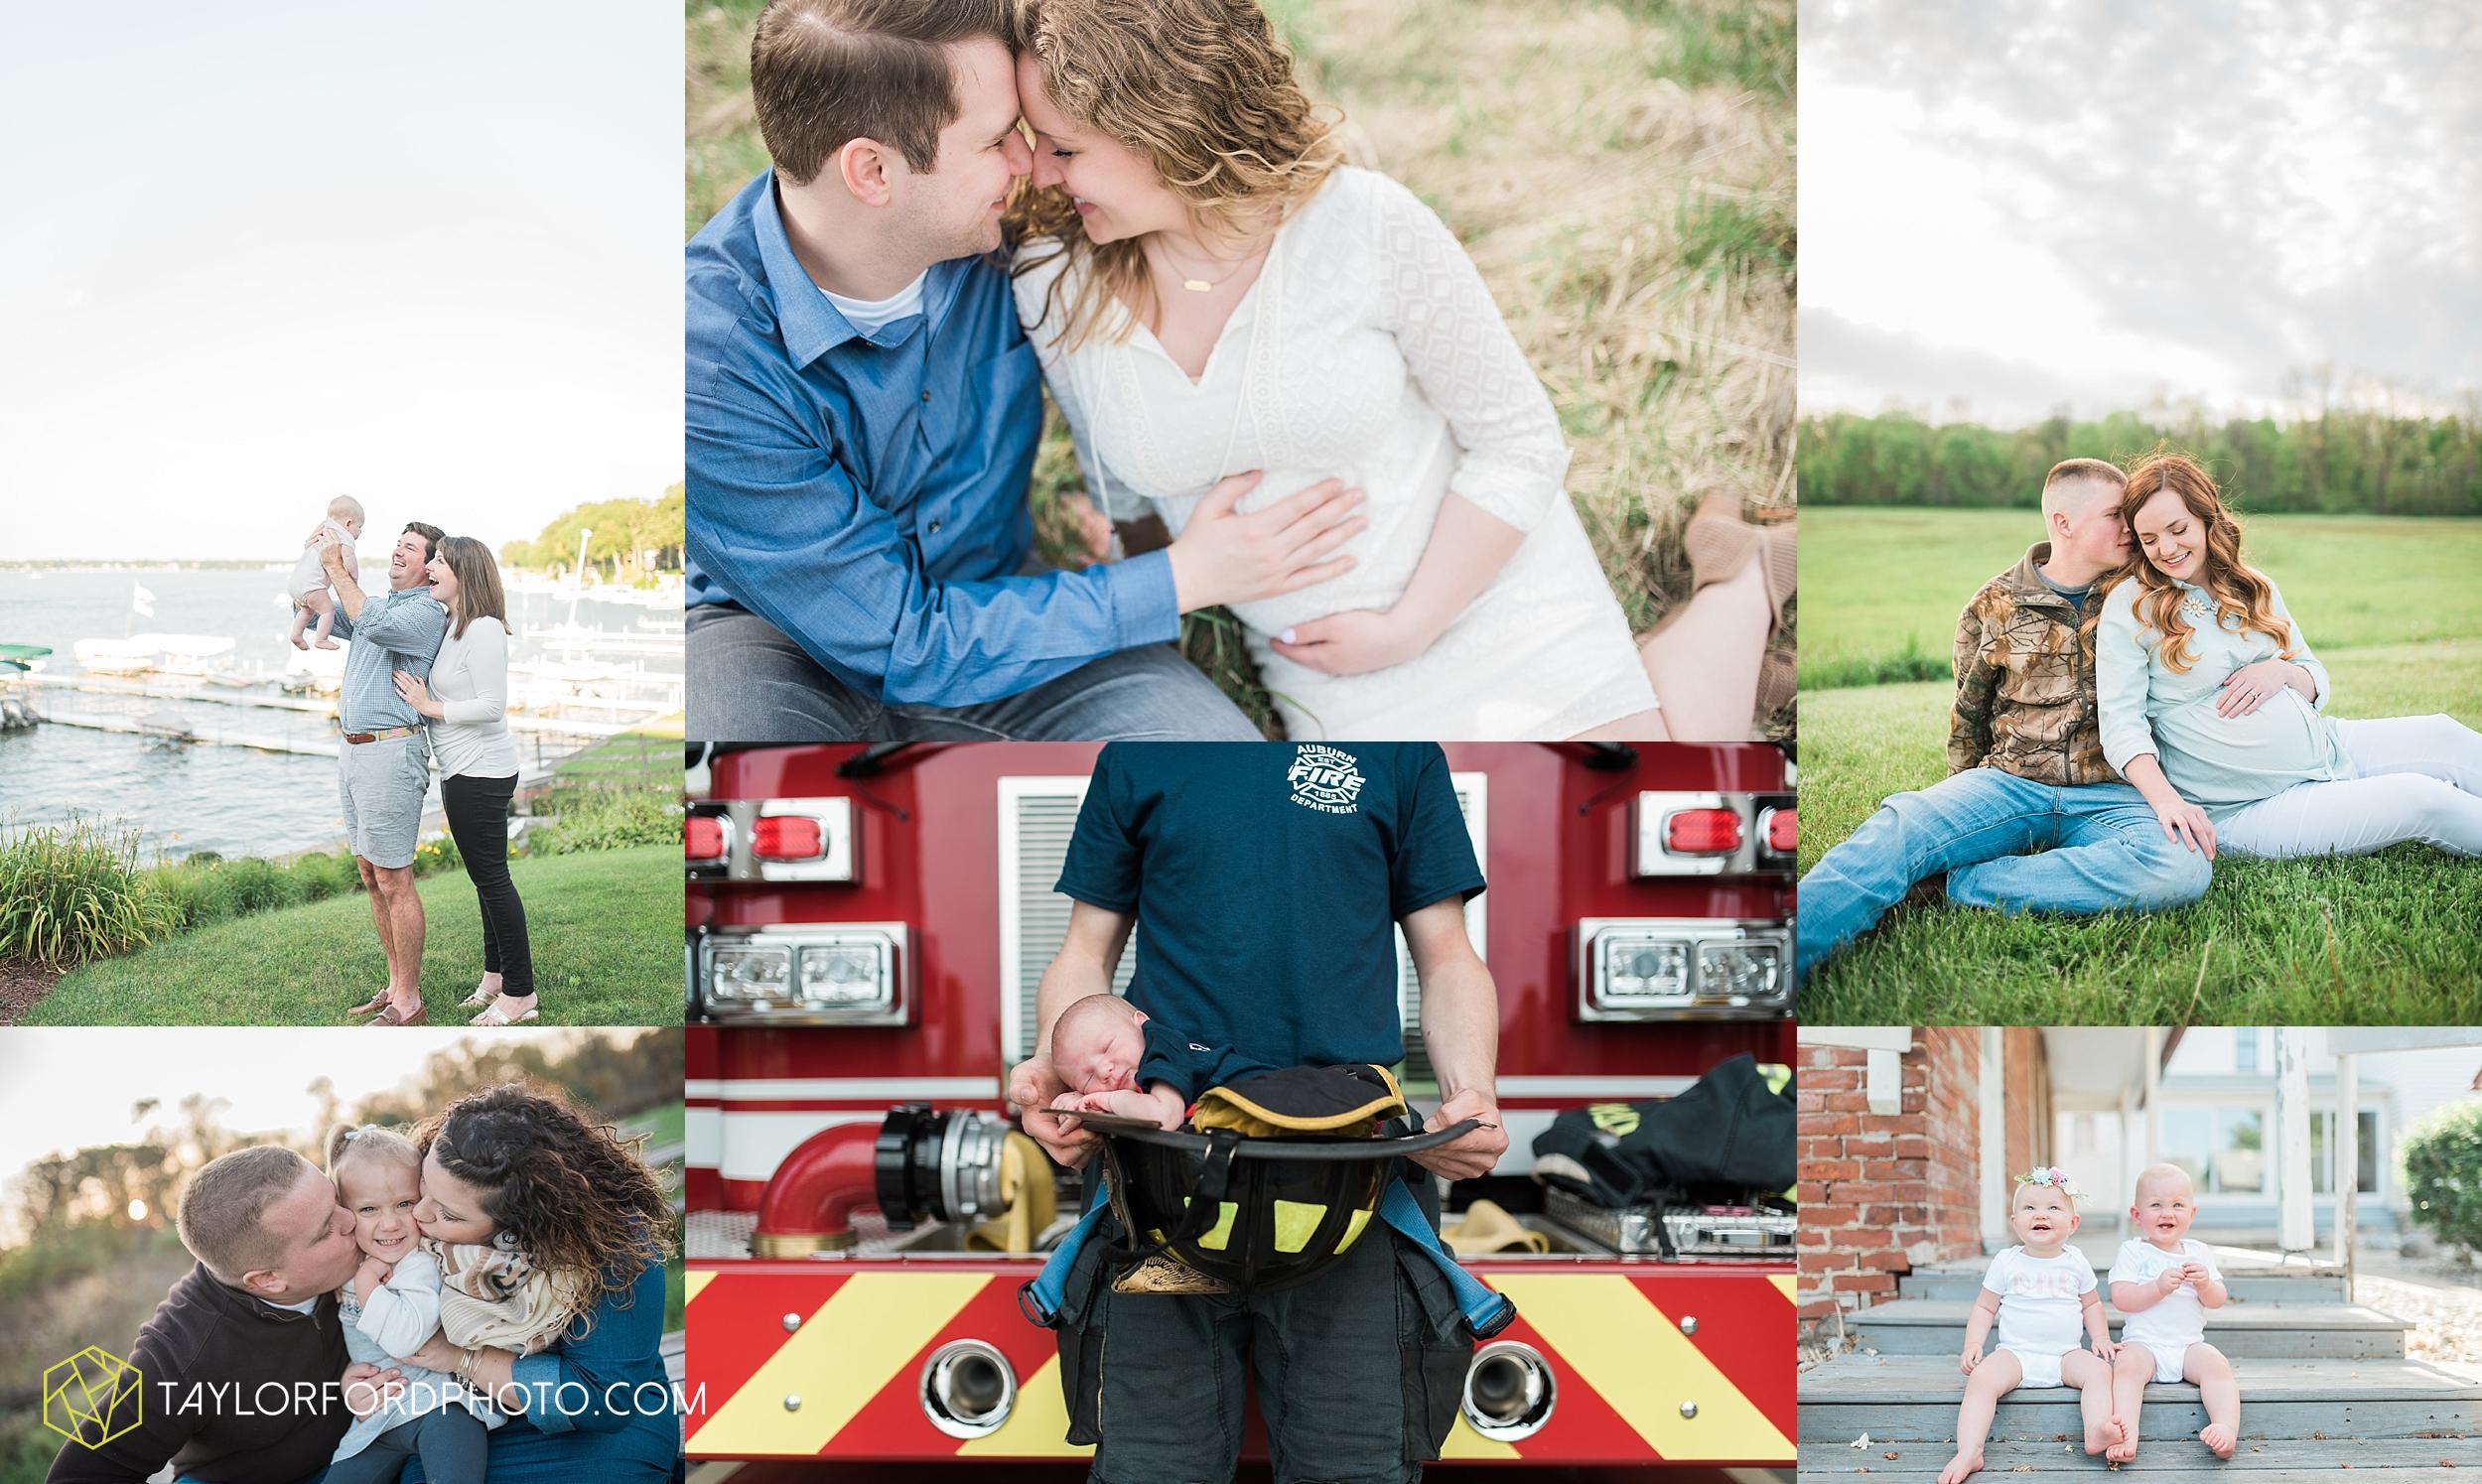 van-wert-ohio-fort-wayne-indiana-photographer-Taylor-Ford-Photography-wedding-engagement-family-senior_4405.jpg